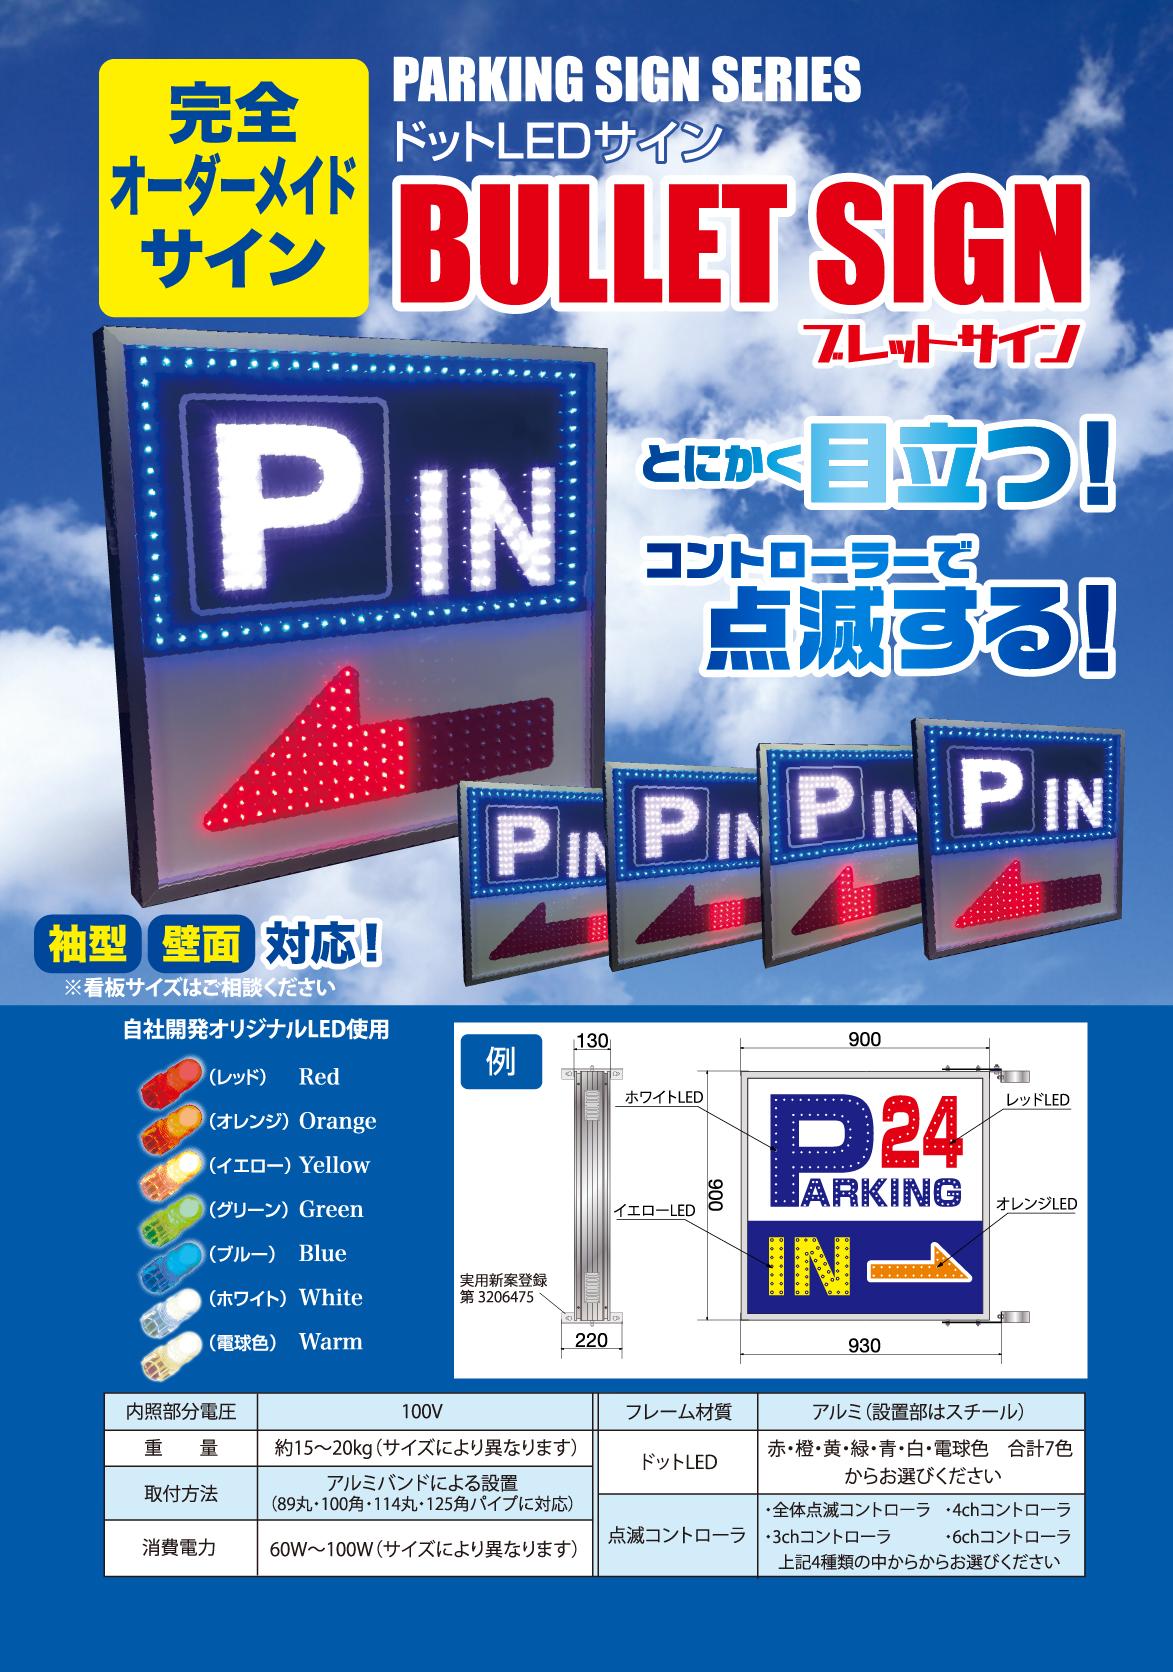 BULLET SIGN 砲弾型LEDを使用した完全オーダーメイドが可能な表示器のご紹介画像です。